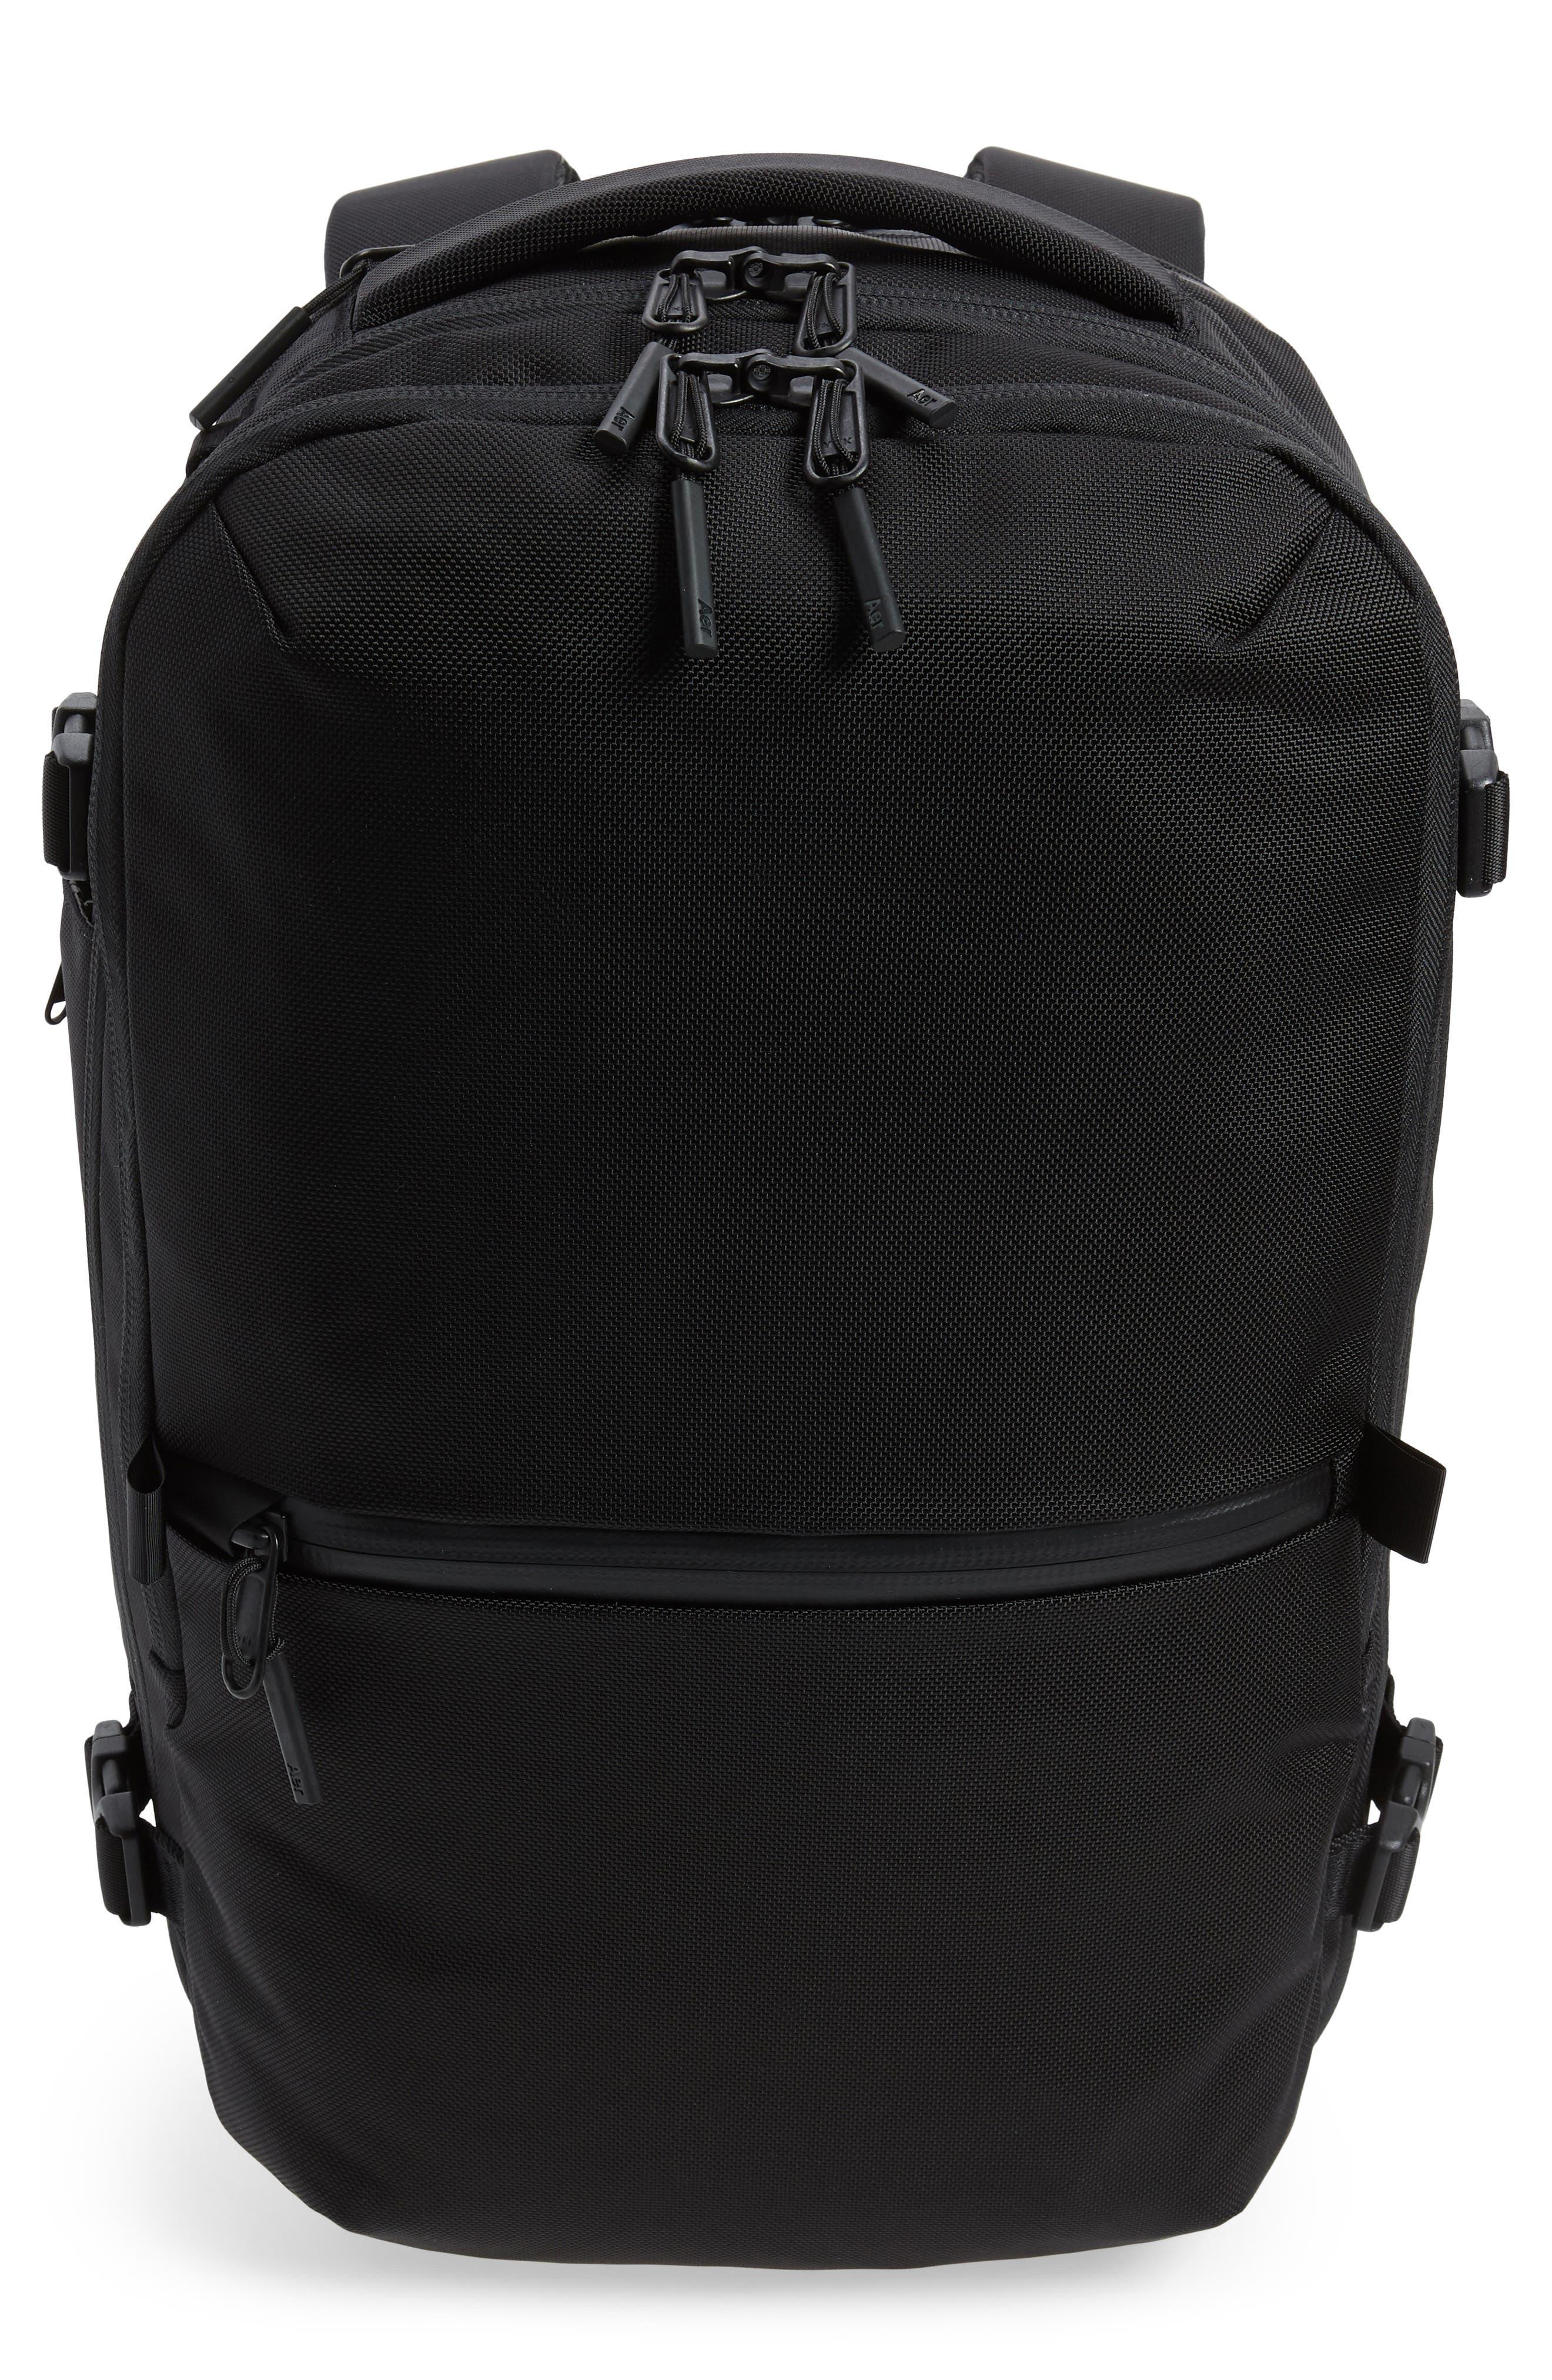 Travel Pack 2 Backpack,                             Main thumbnail 1, color,                             BLACK